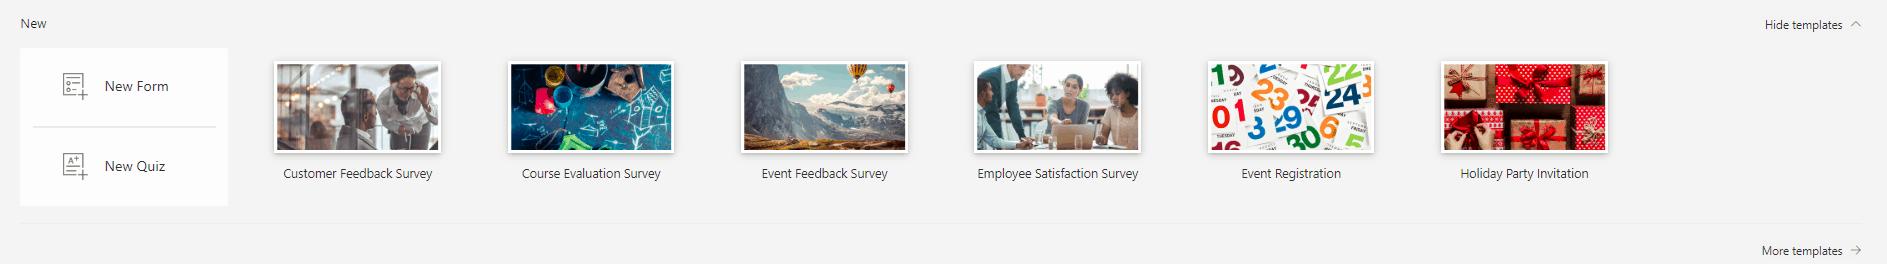 Microsoft Form survey templates